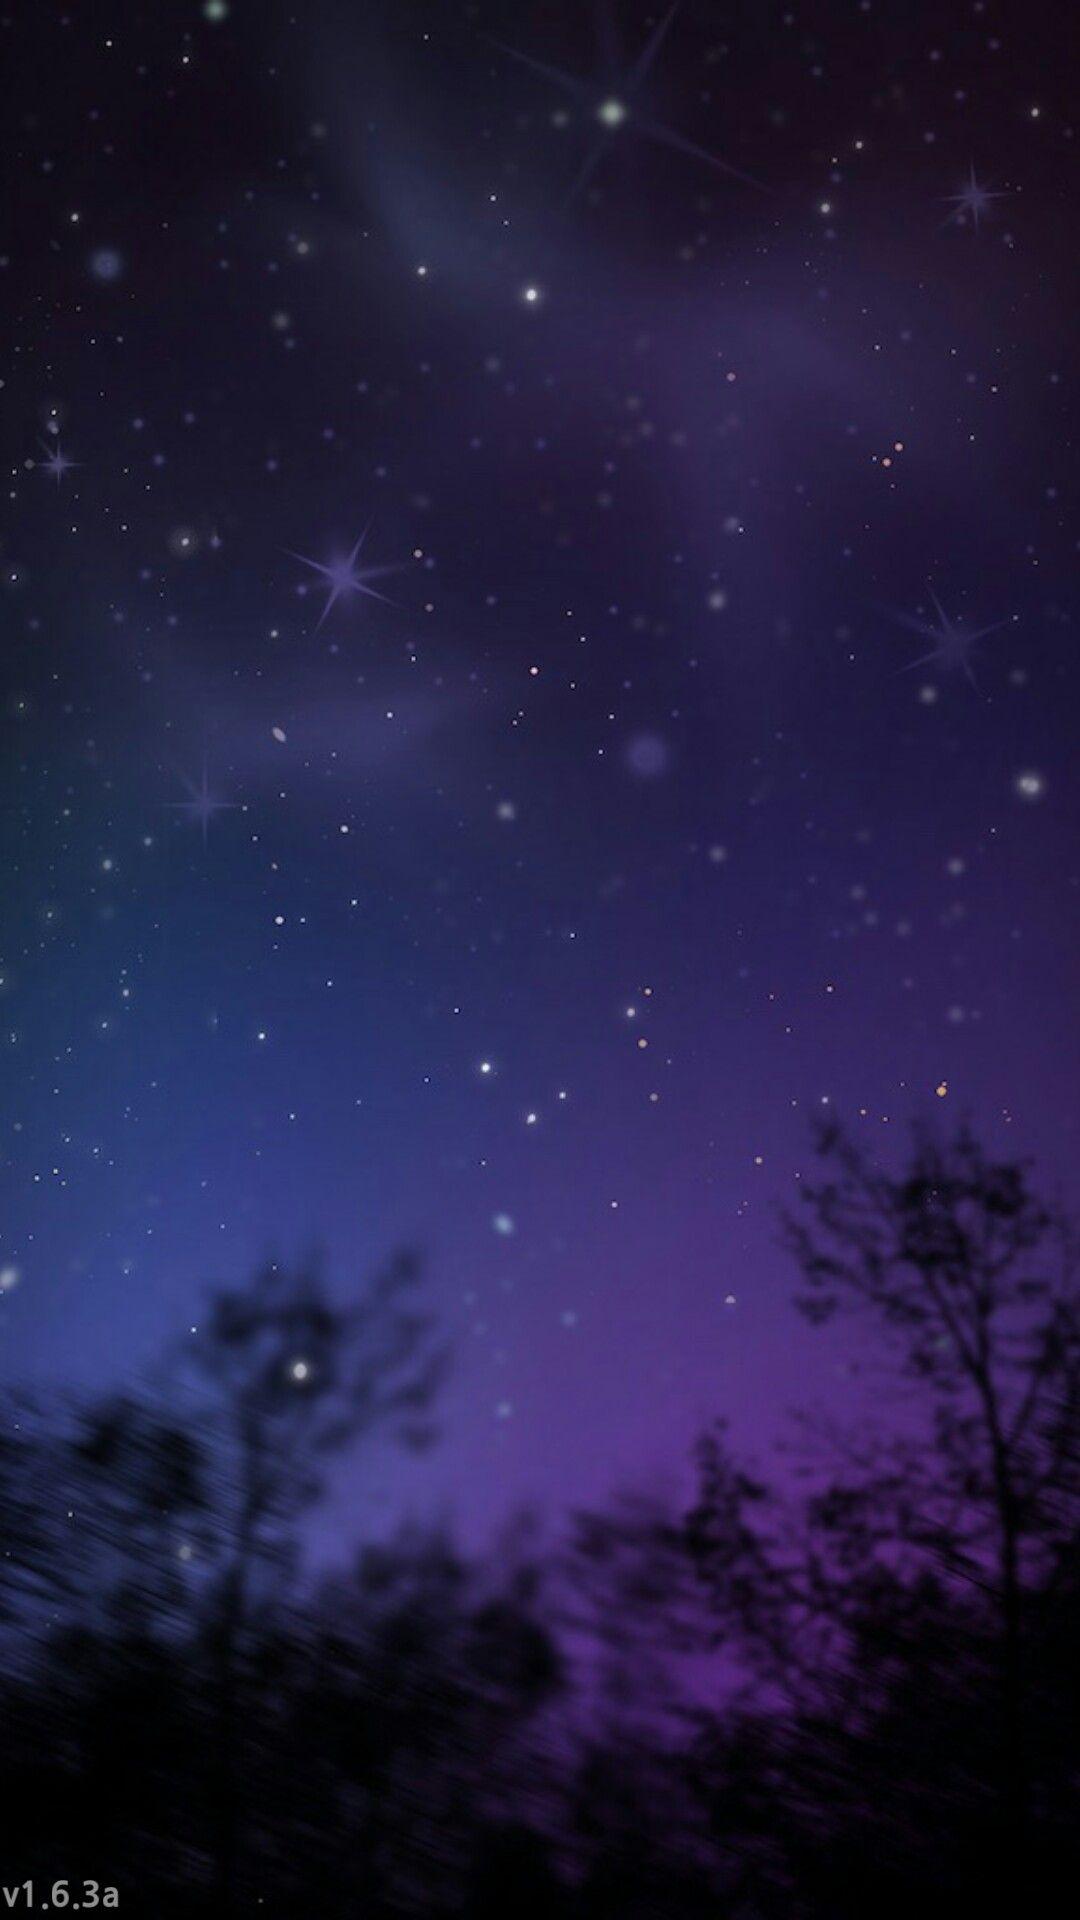 Beautiful background MysticMessenger Fotos originales